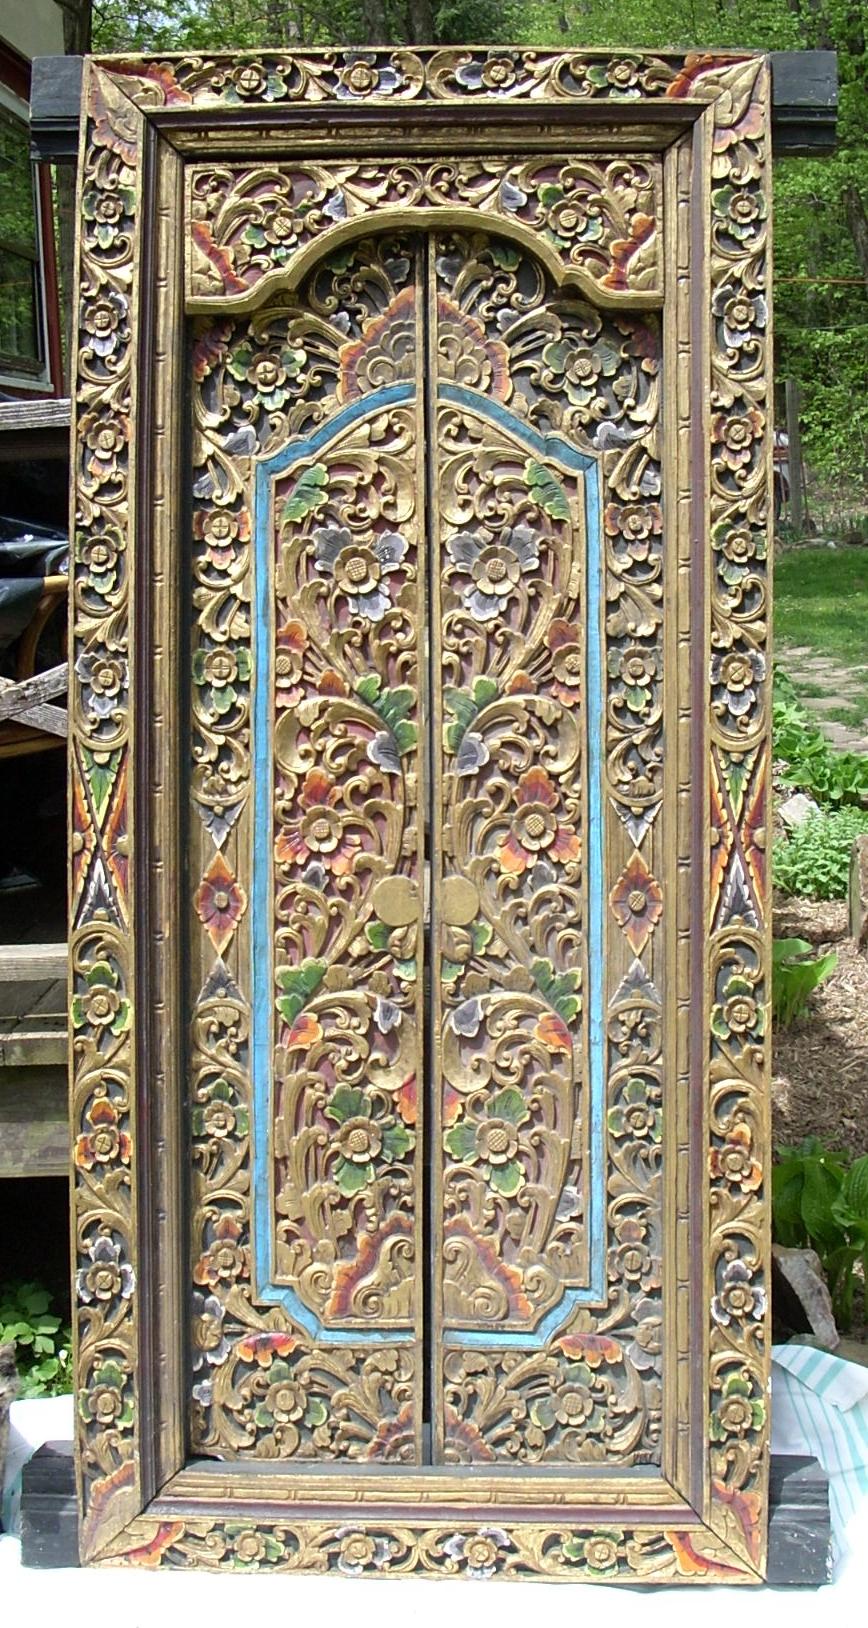 Balinese Temple Doors · Persian Rug Pillows & Past Favorites - Marierogatantiques.com